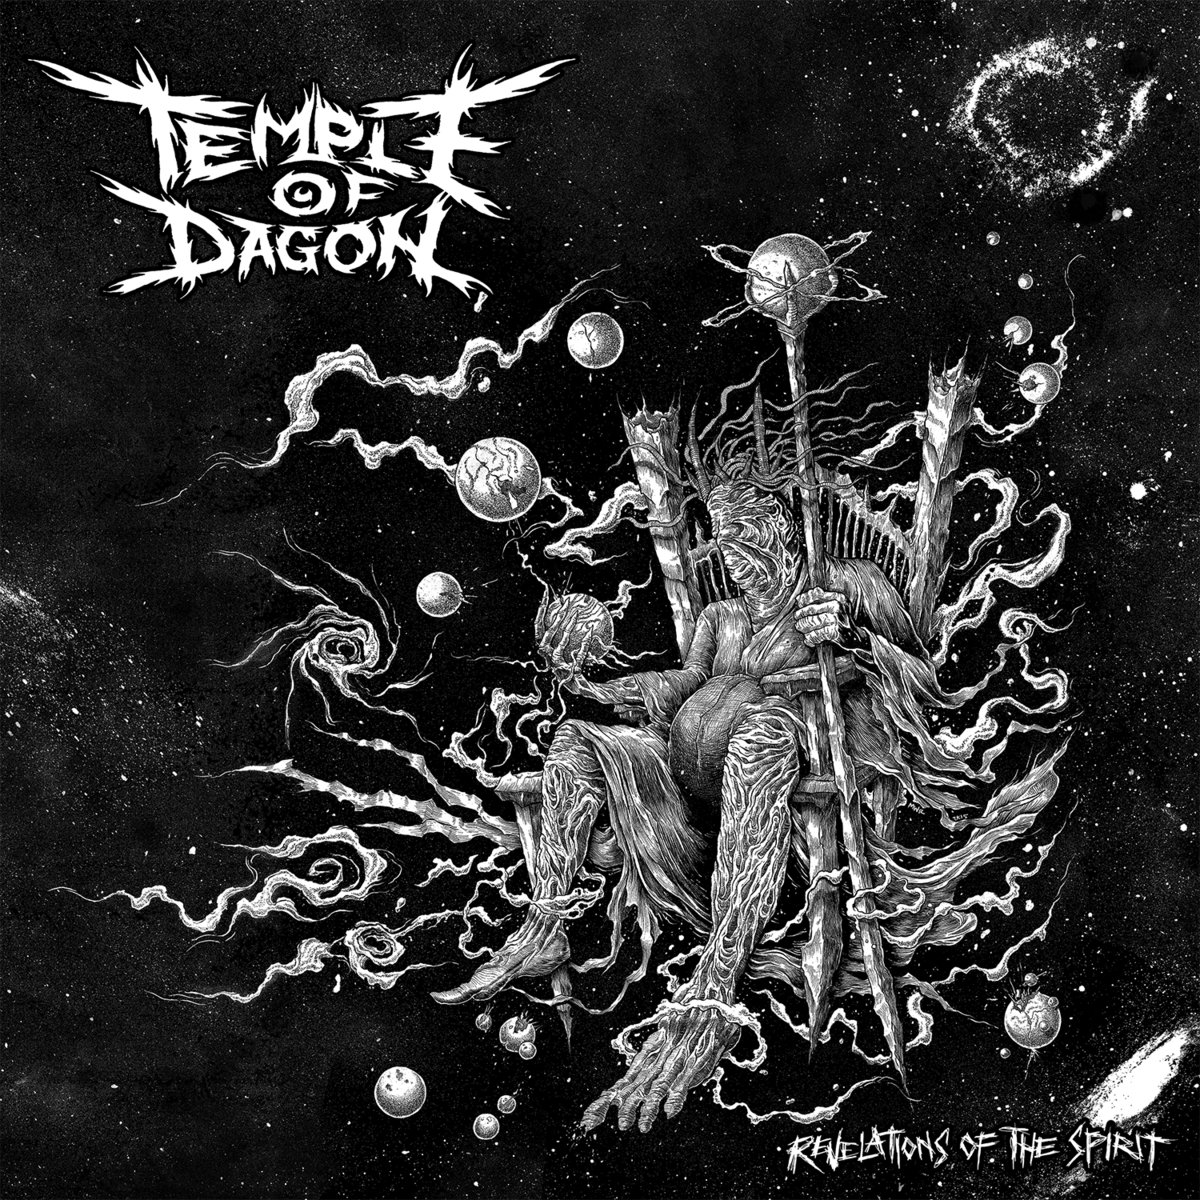 Temple Of Dagon - Revelations of the Spirit